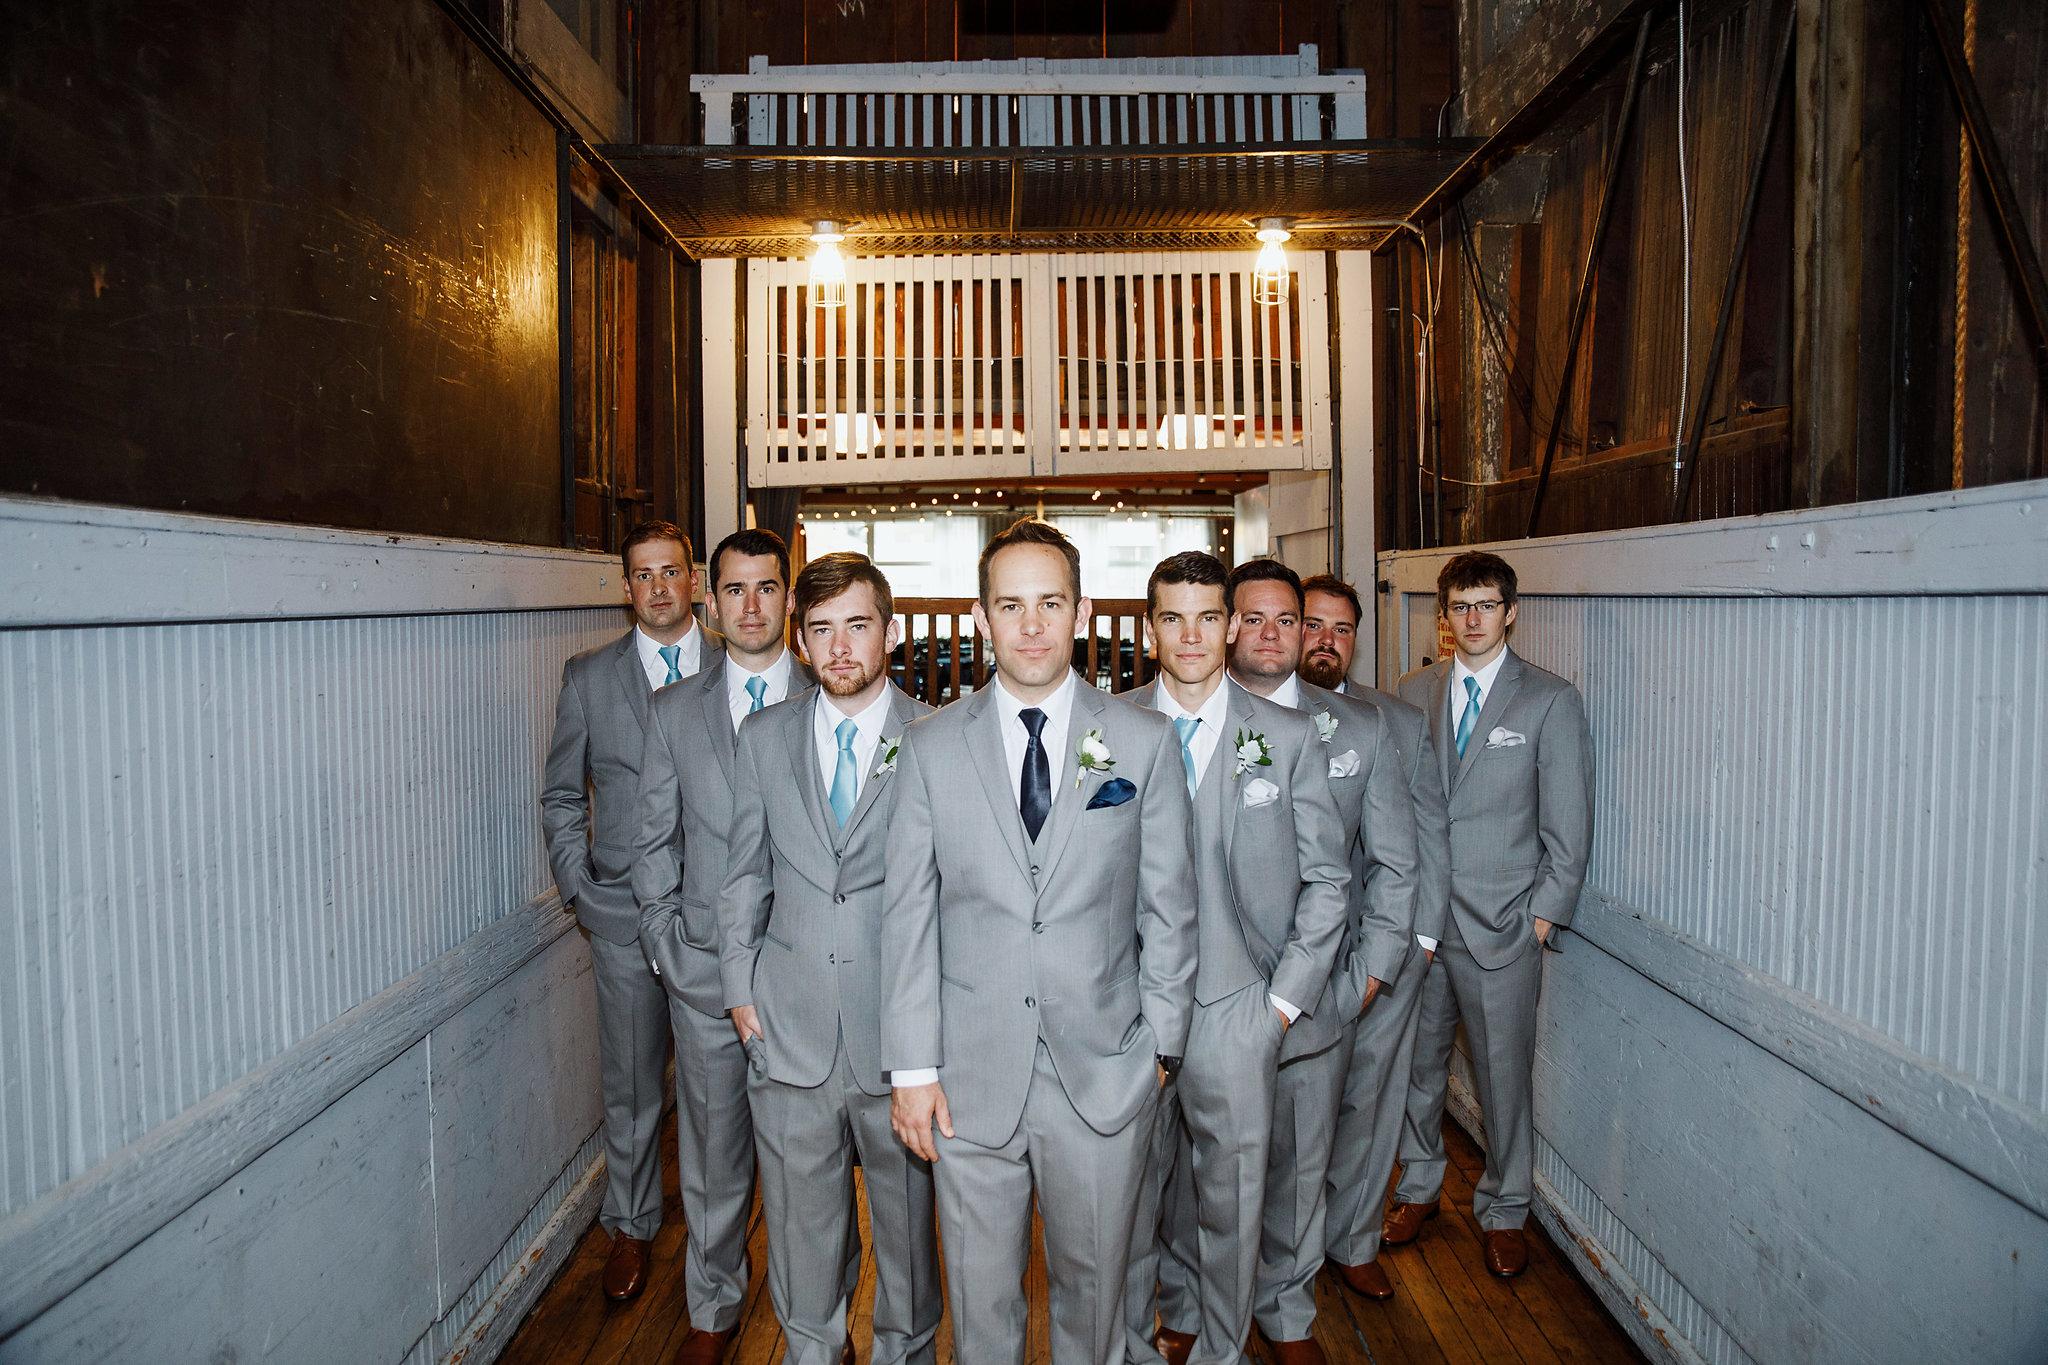 Berg Event Space Wedding_Loose Mansion Winter Wedding_Kindling Wedding Photography_03.JPG